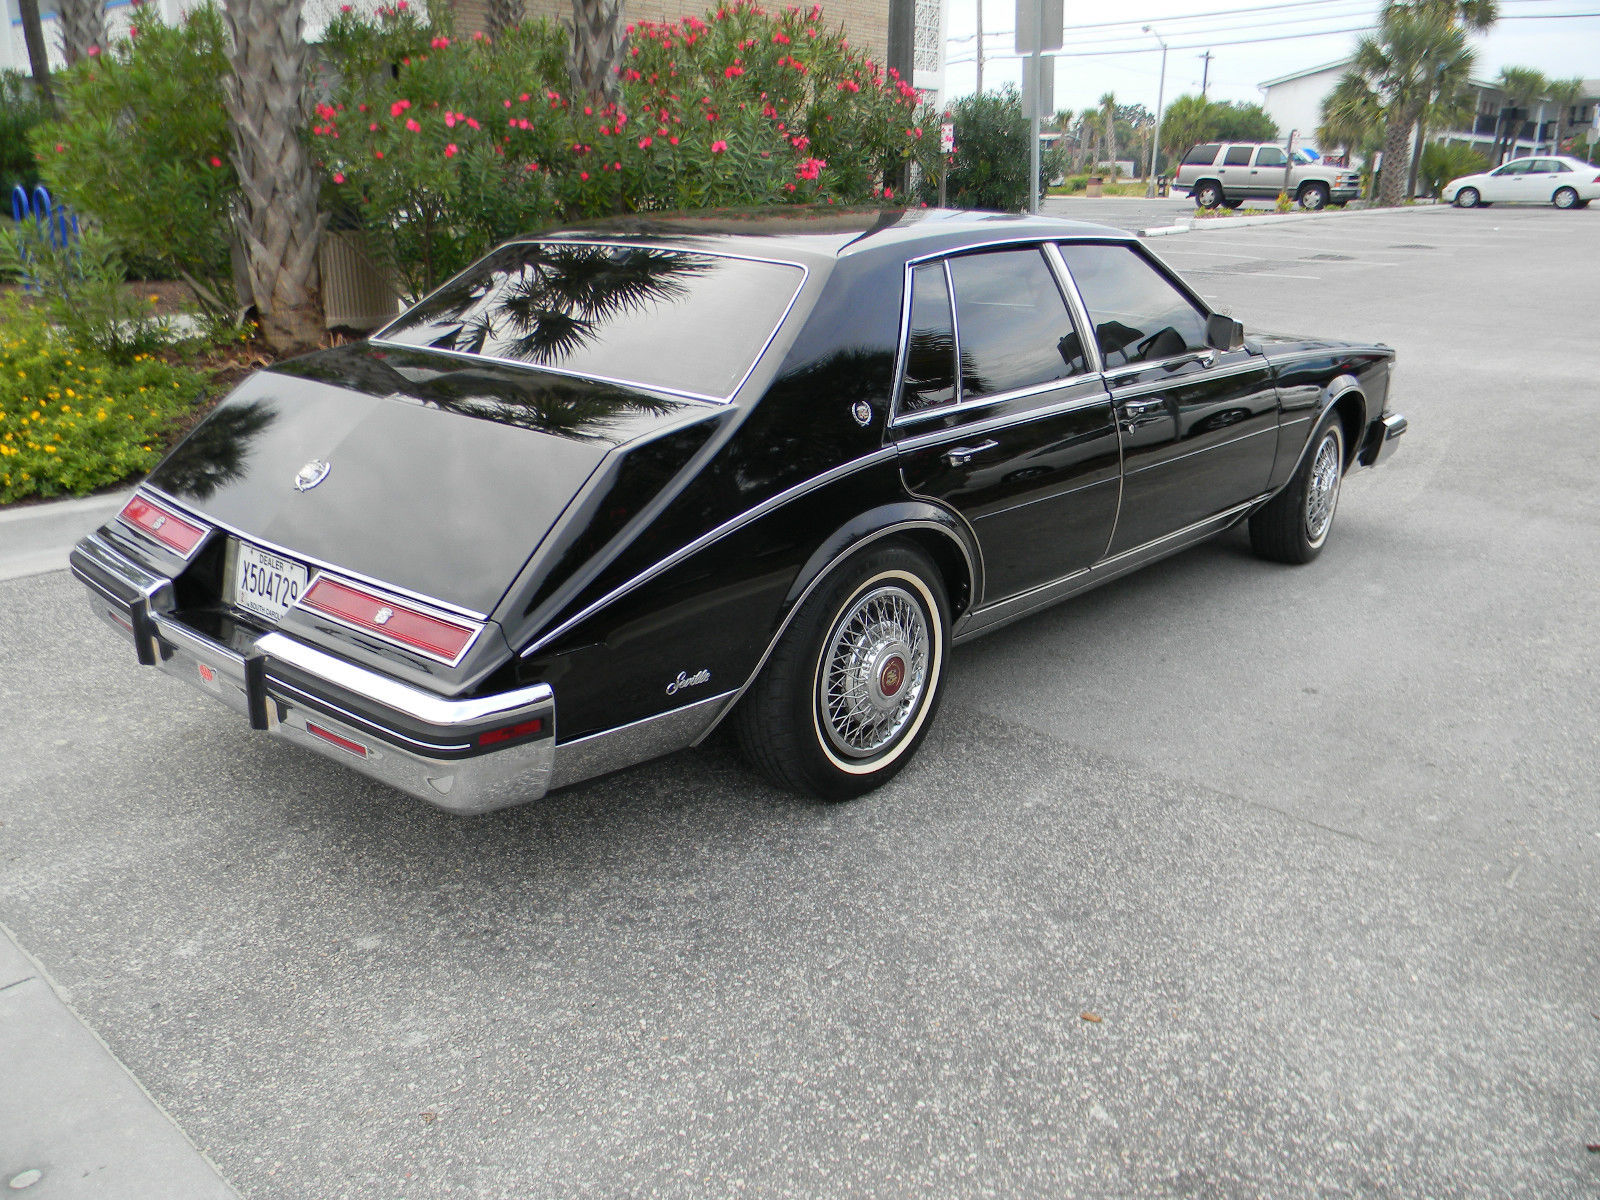 Myrtle Beach Cadillac >> 1985 Cadillac Seville Elegante Sedan 4-Door 4.1L - Classic ...